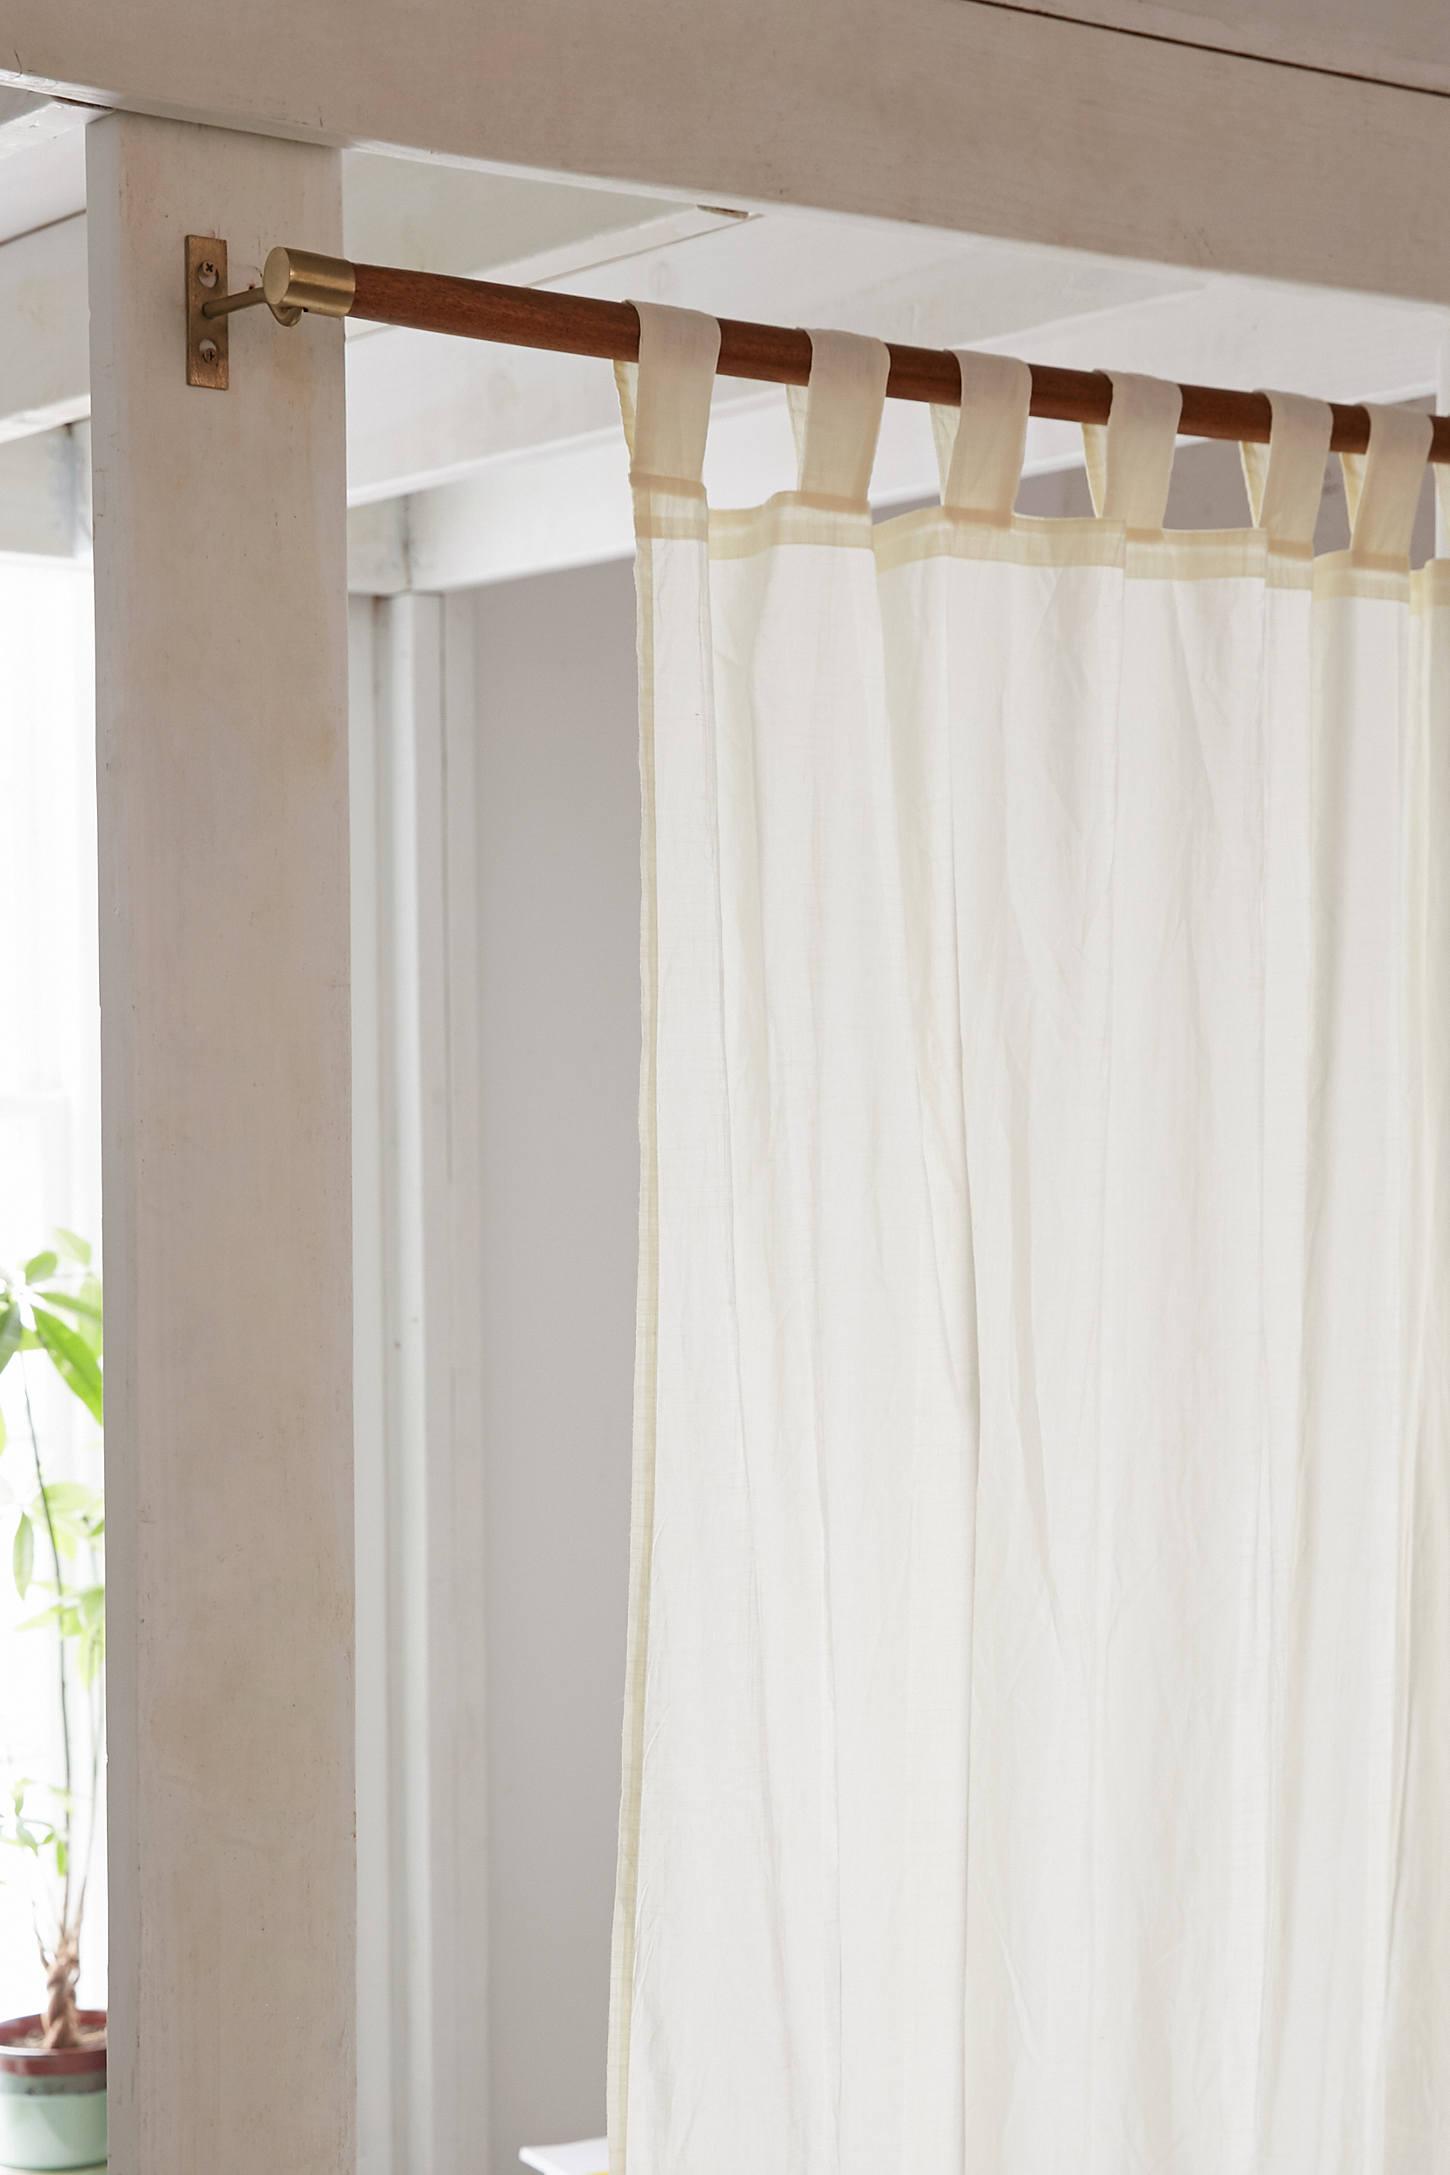 Modern wood curtain rod - Slide View 1 Mid Century Modern Wooden Curtain Rod